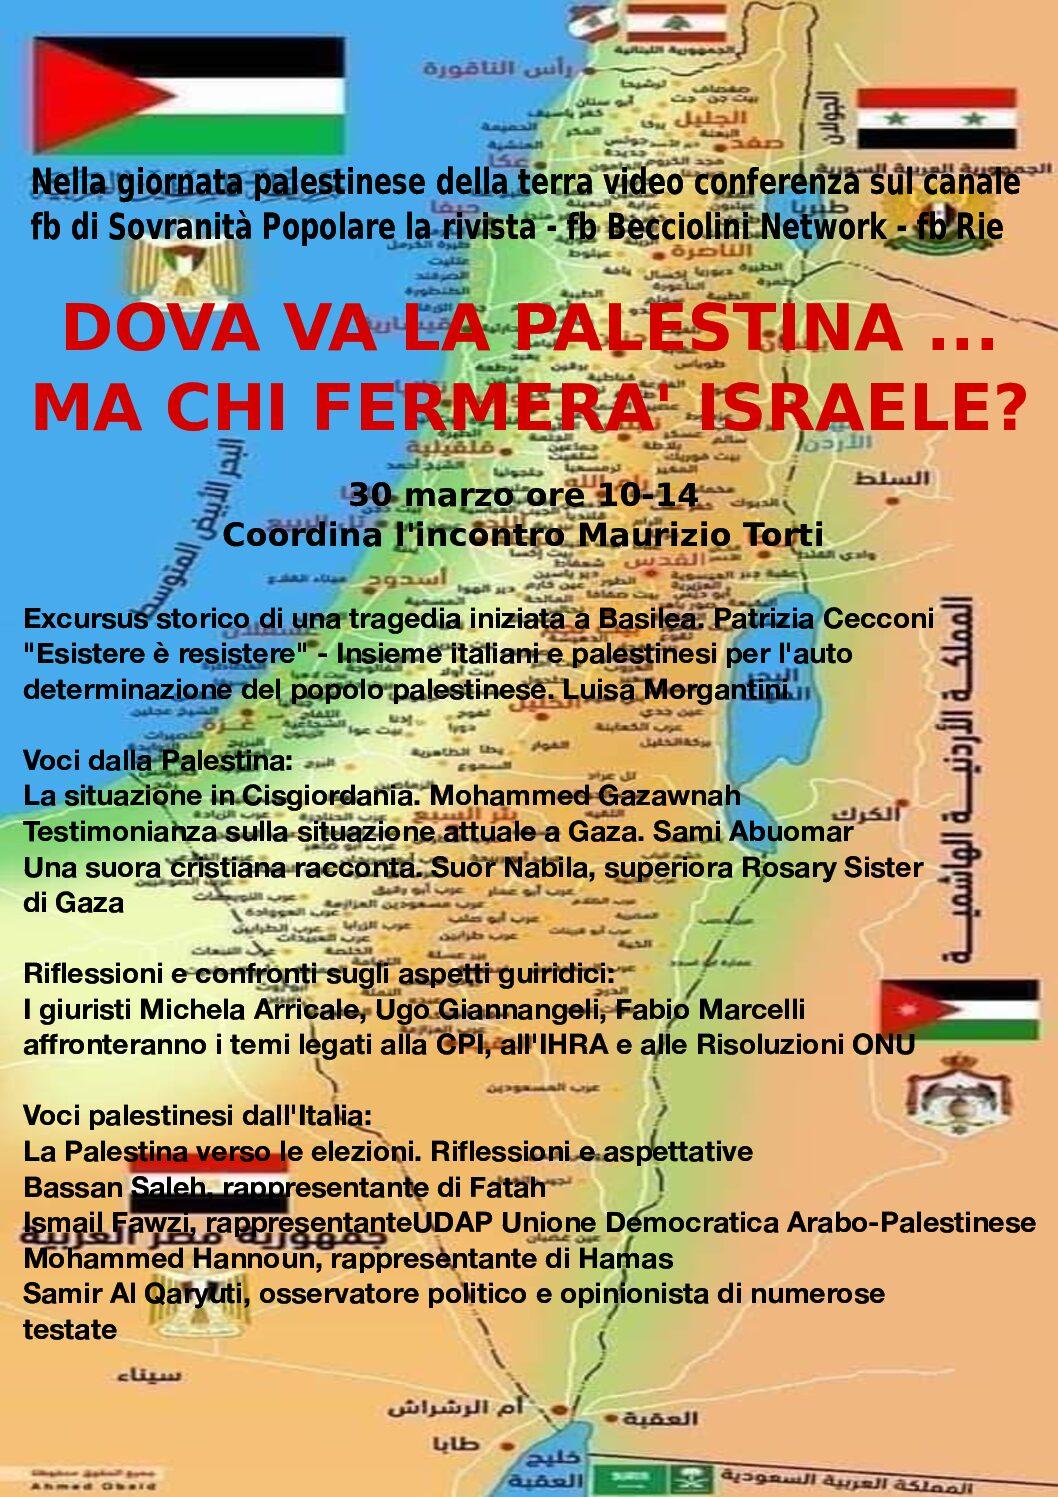 Dove va la Palestina … ma chi fermerà Israele?